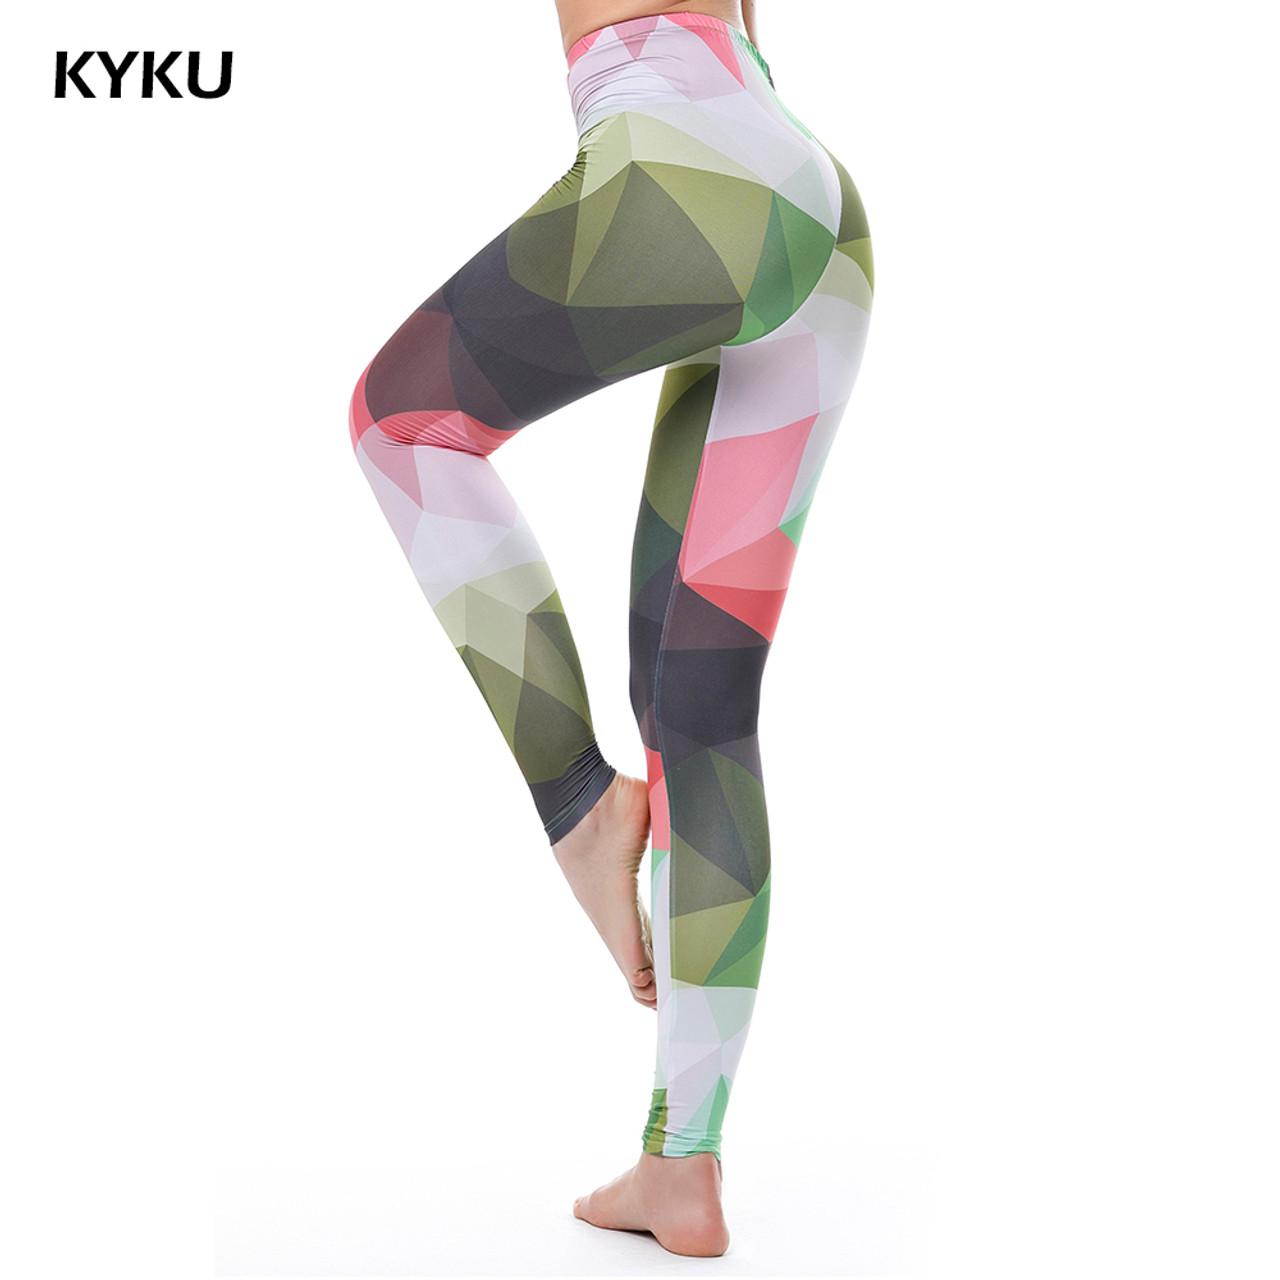 f0cba90e10bfa High Waist Colorful Leggings For Women Fitness Legging Push Up Leggings  Women Camouflage Leggins Sexy Fashion ...